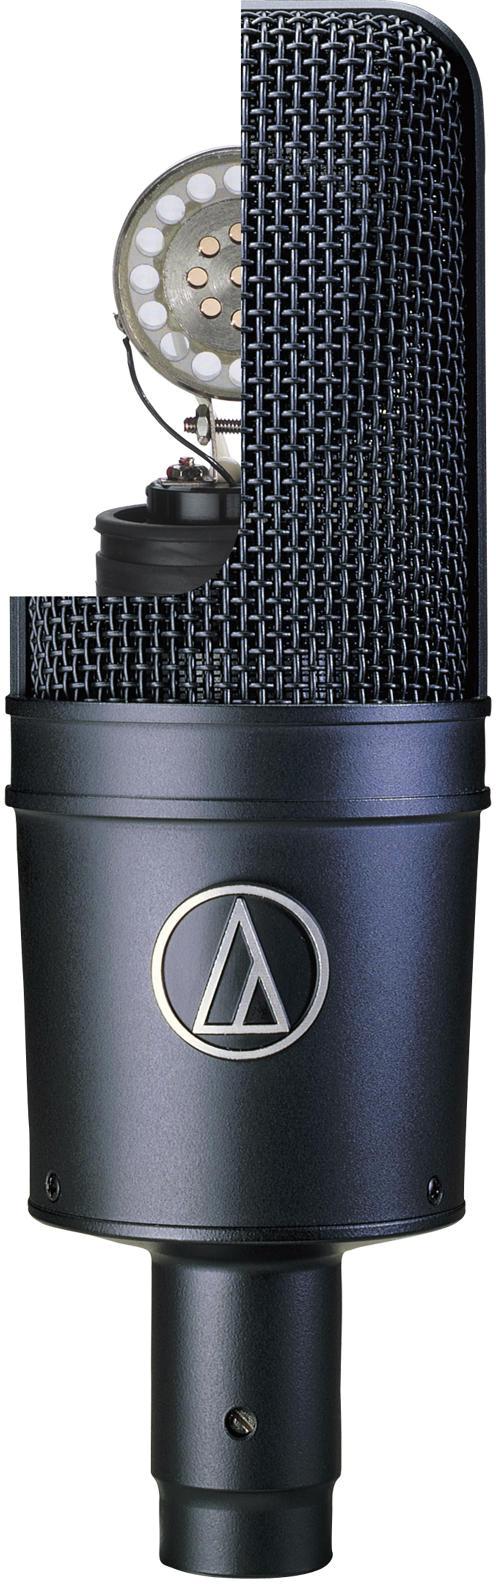 audio technica at4033a cardioid condenser microphone ebay. Black Bedroom Furniture Sets. Home Design Ideas